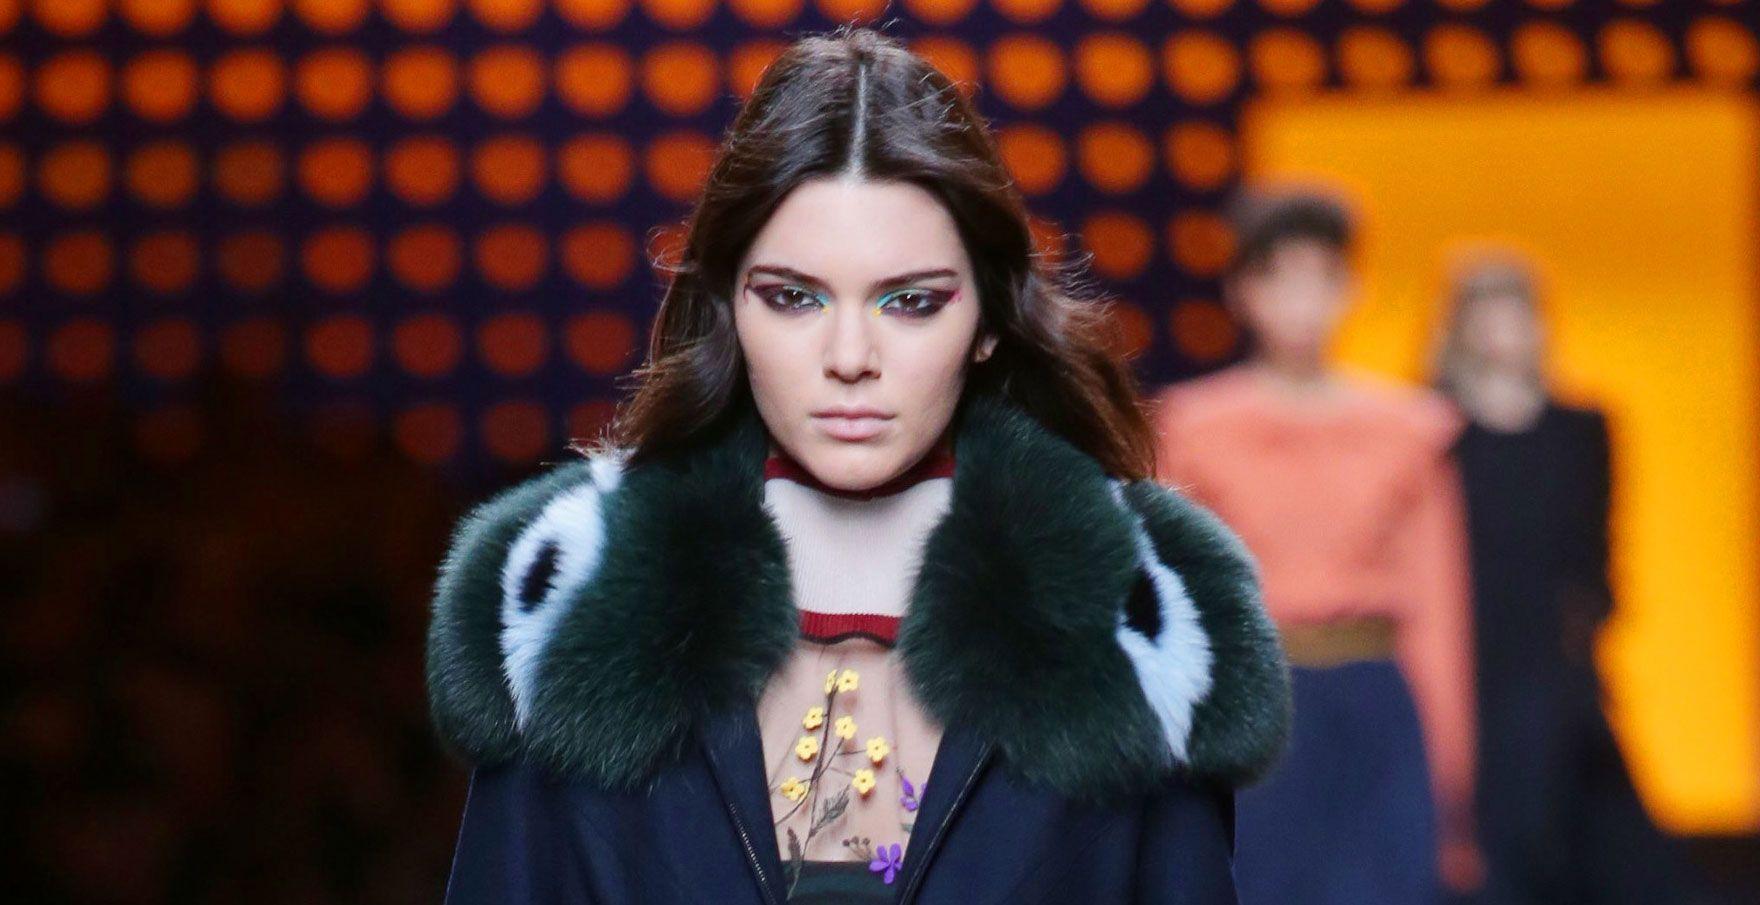 Milano Fashion Week 2016: i trend make-up e hairstyle